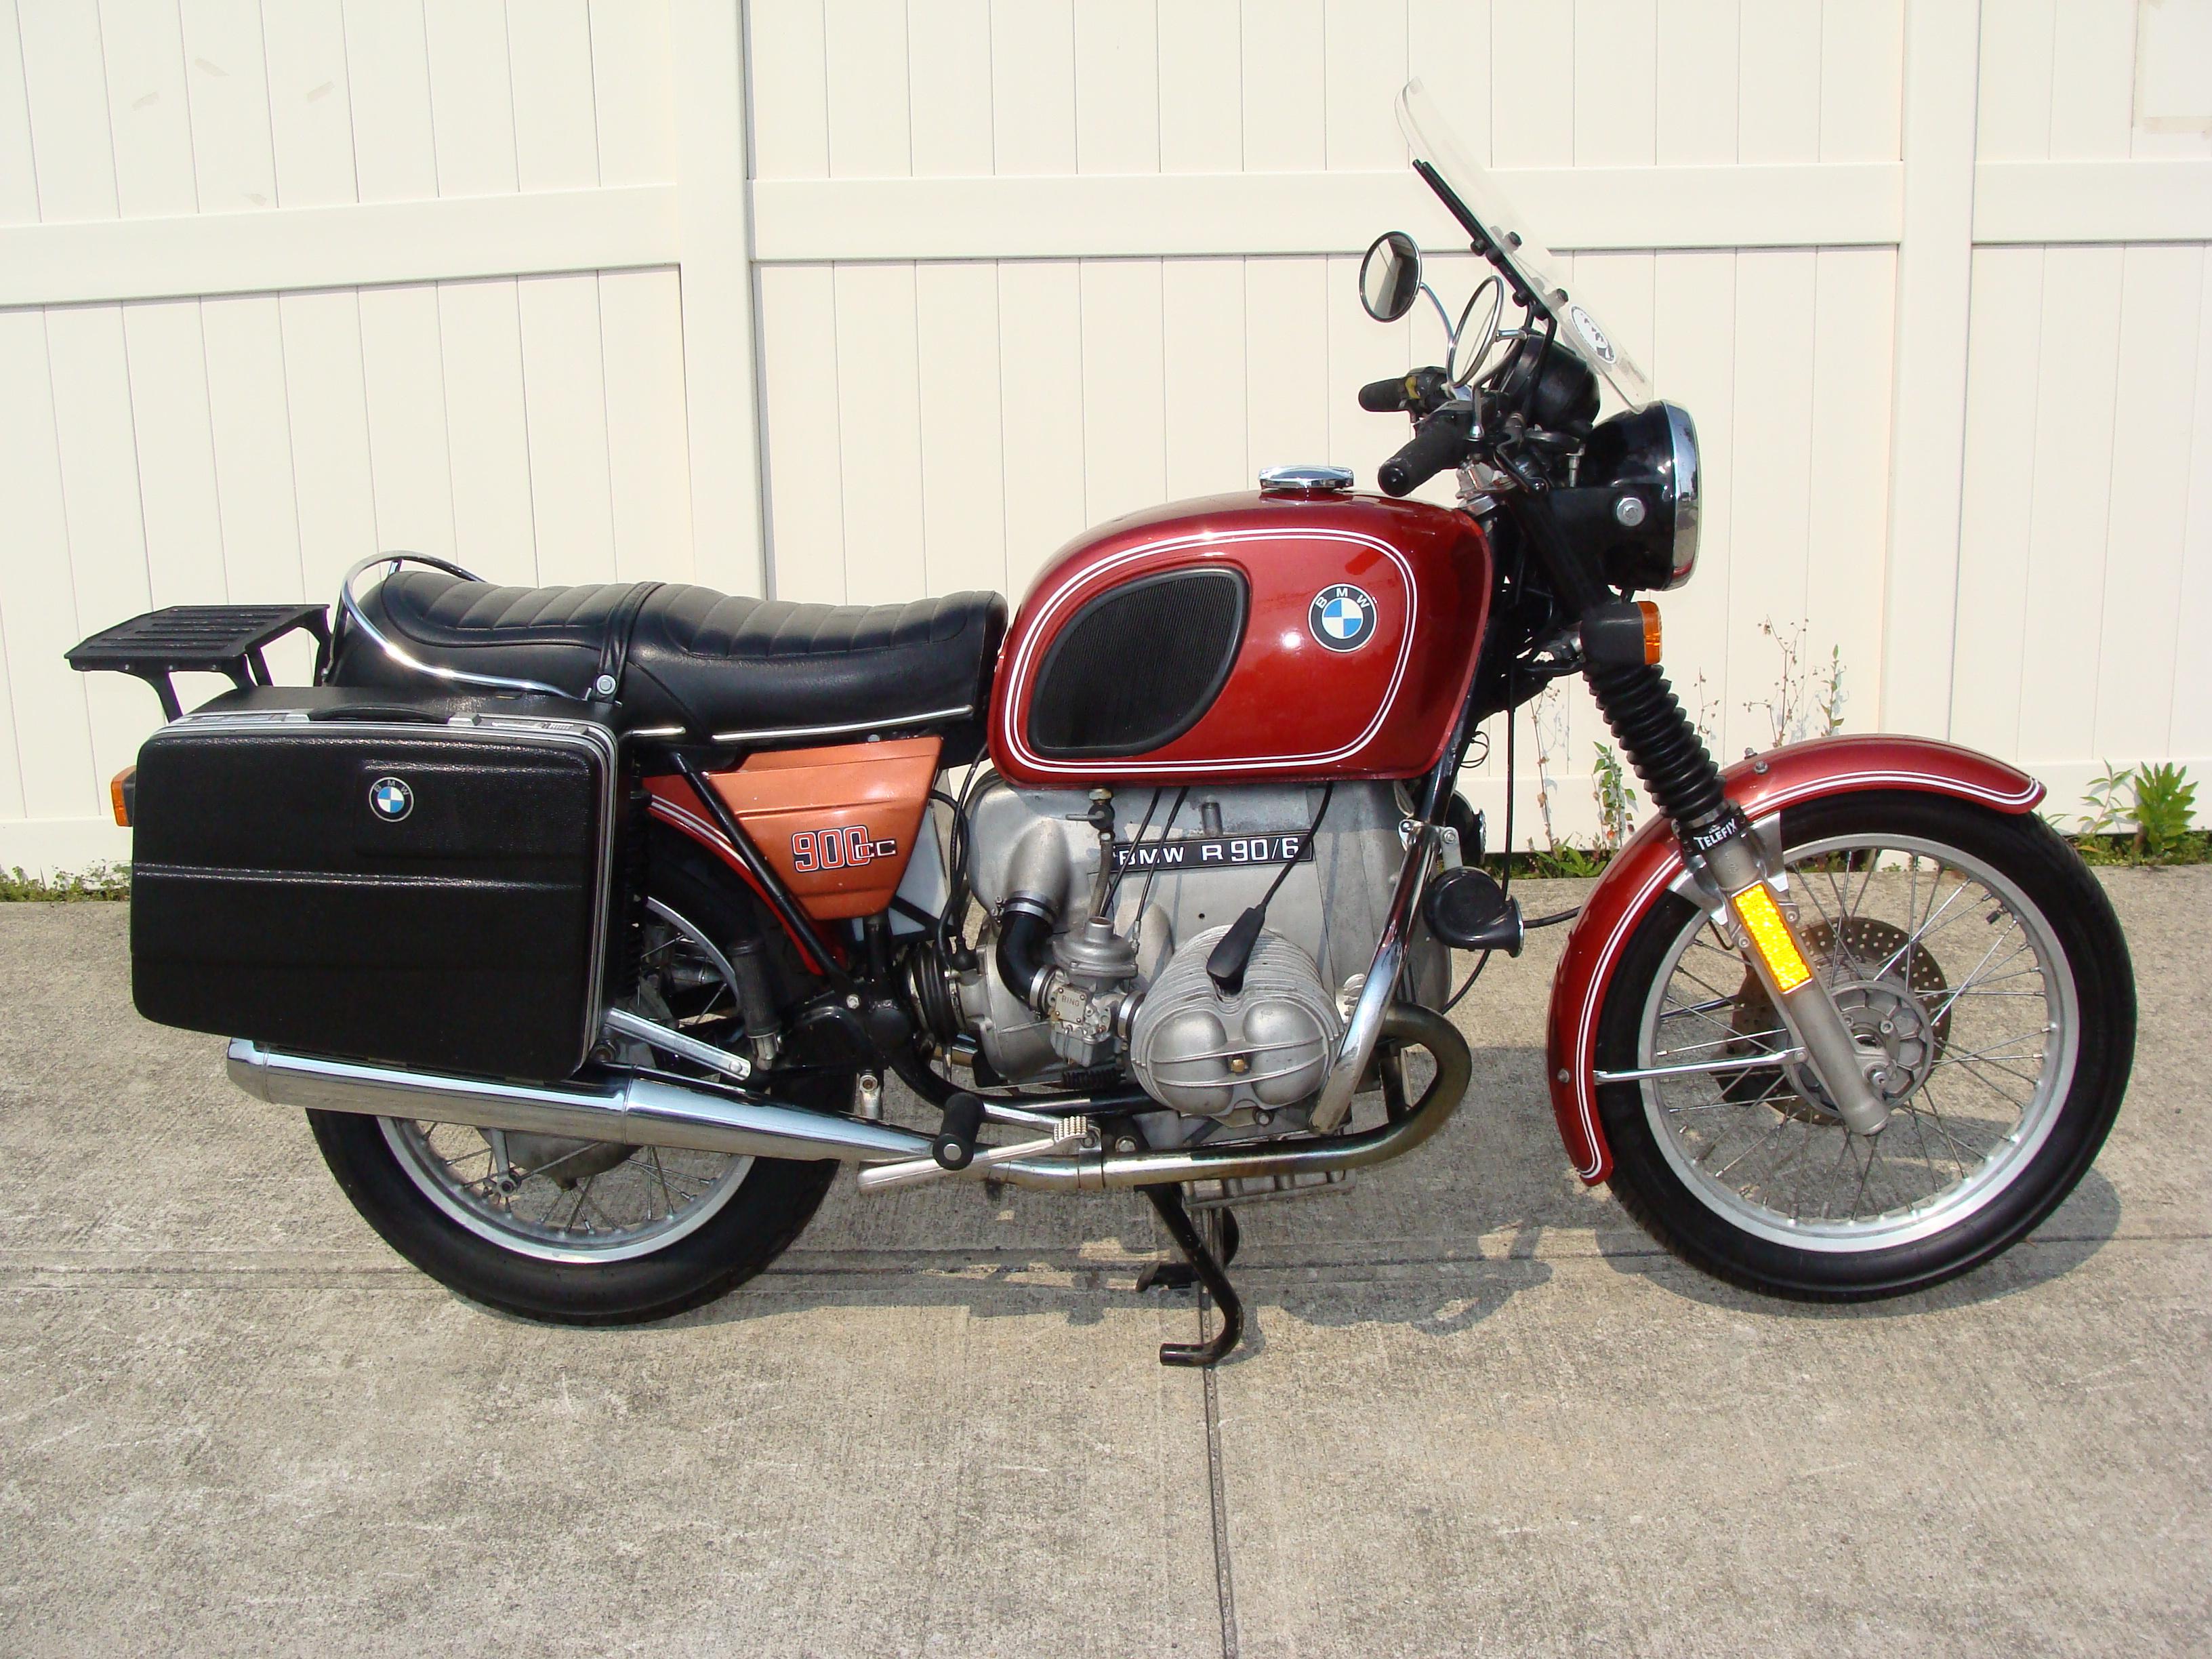 4964226 75 r90 6 copper 016 sold 4964226 1976 bmw r90 6 rh repsyclebmw picturepush com Custom BMW Motorcycle Custom BMW Motorcycle